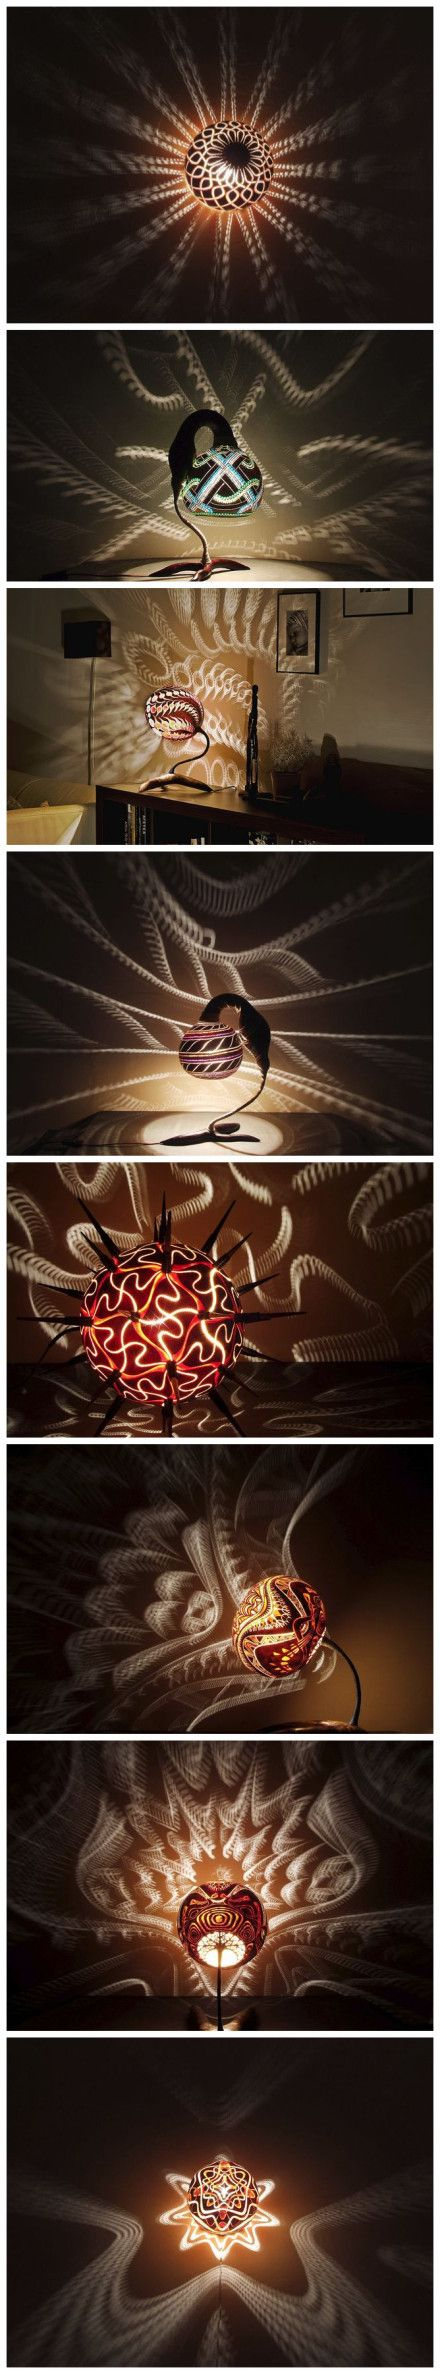 gourd lamp  Judy, I luv this! Do u make them?